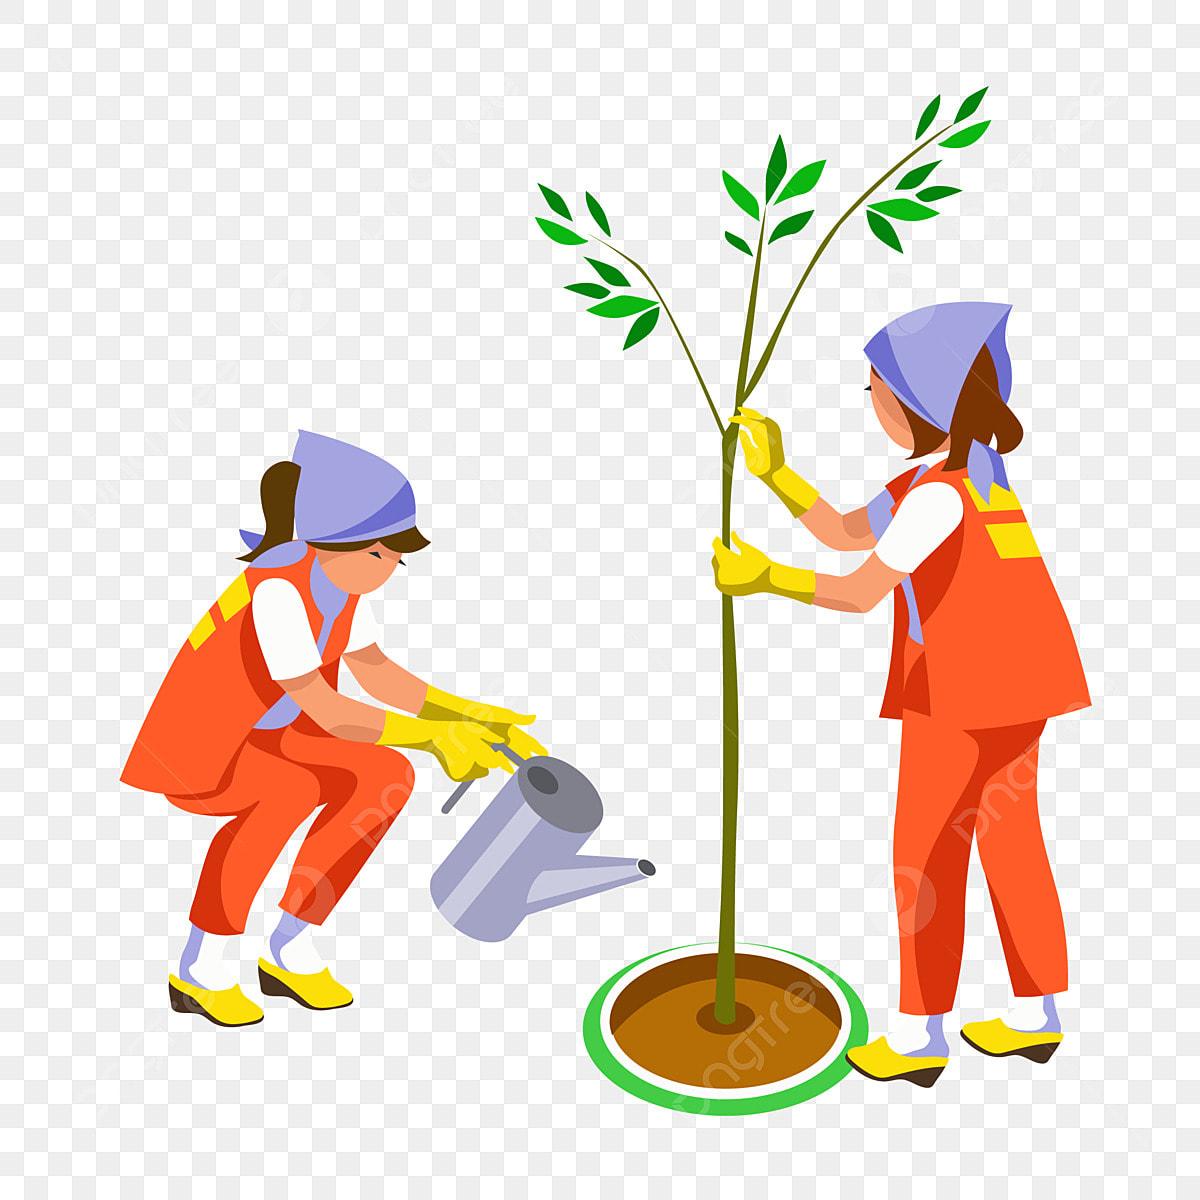 Garden Garden Worker Worker Cartoon, Cartoon Worker, Cartoon